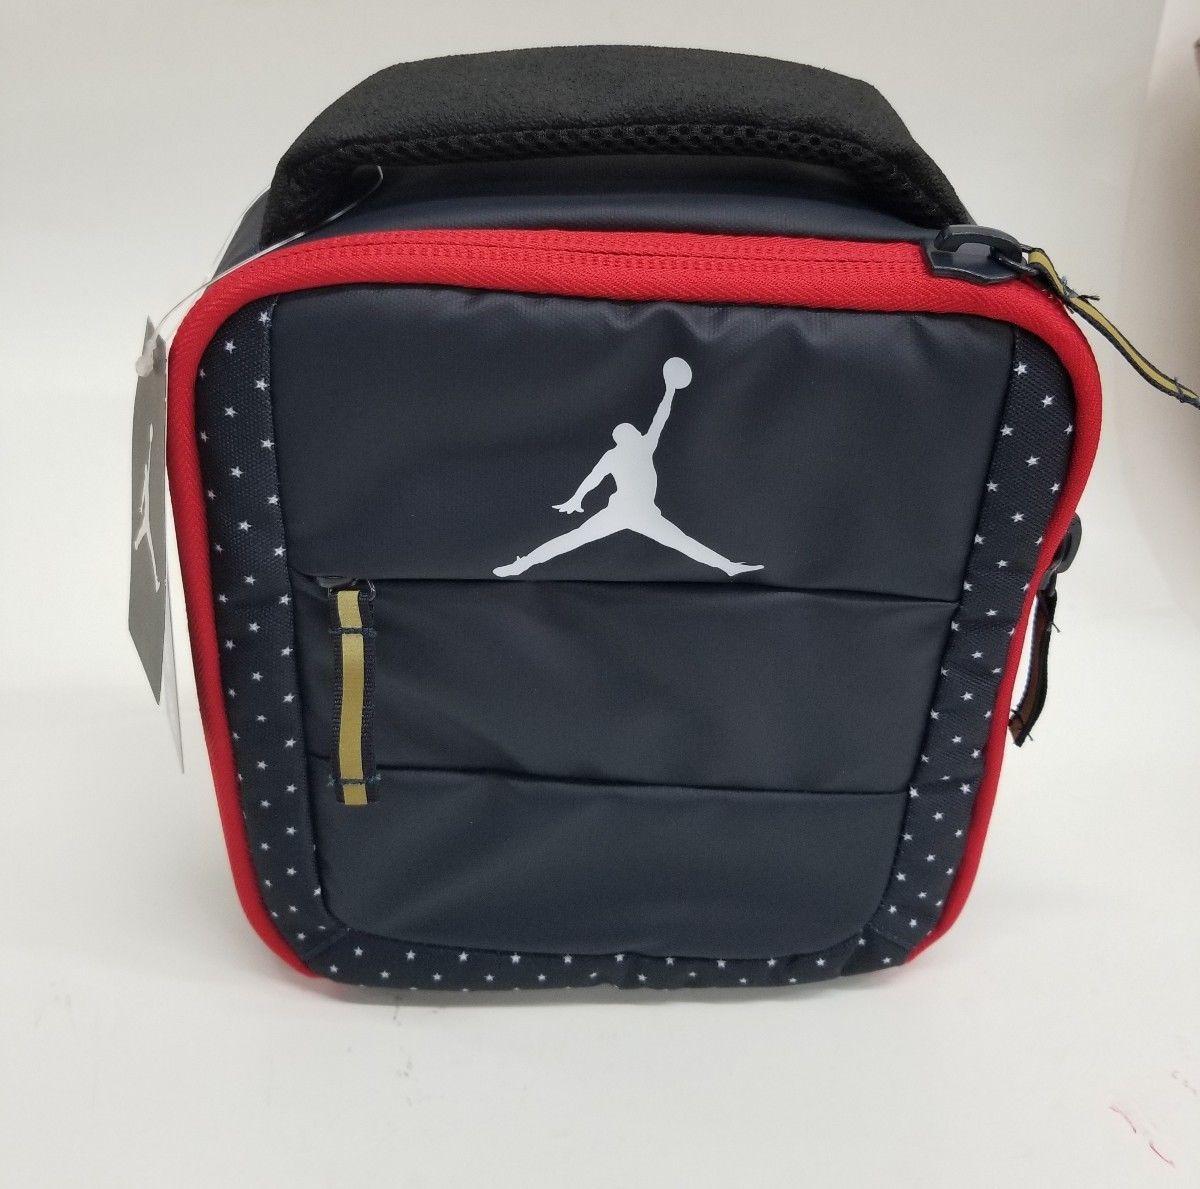 2a89801cd7 Nike Air Jordan Insulated Lunch Box Bag Tote and similar items